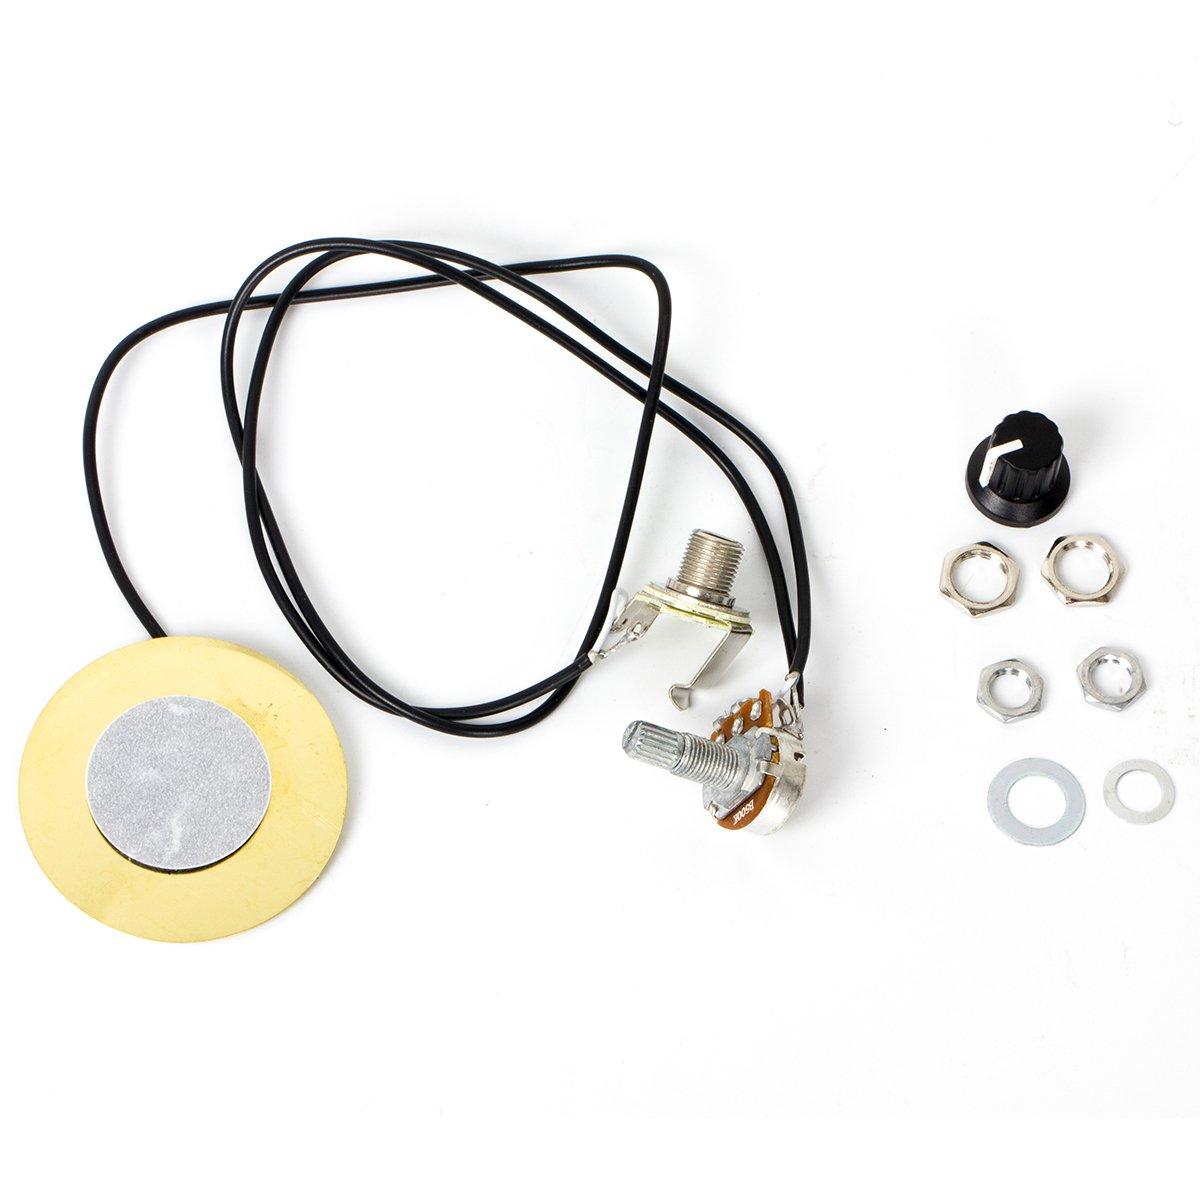 Pickup Piezo Transducer For Acoustic Guitar Violin Ukulele Mandolin Cig Box Parts Replacement 5 Pcs Kmise MI0860-5-KUS